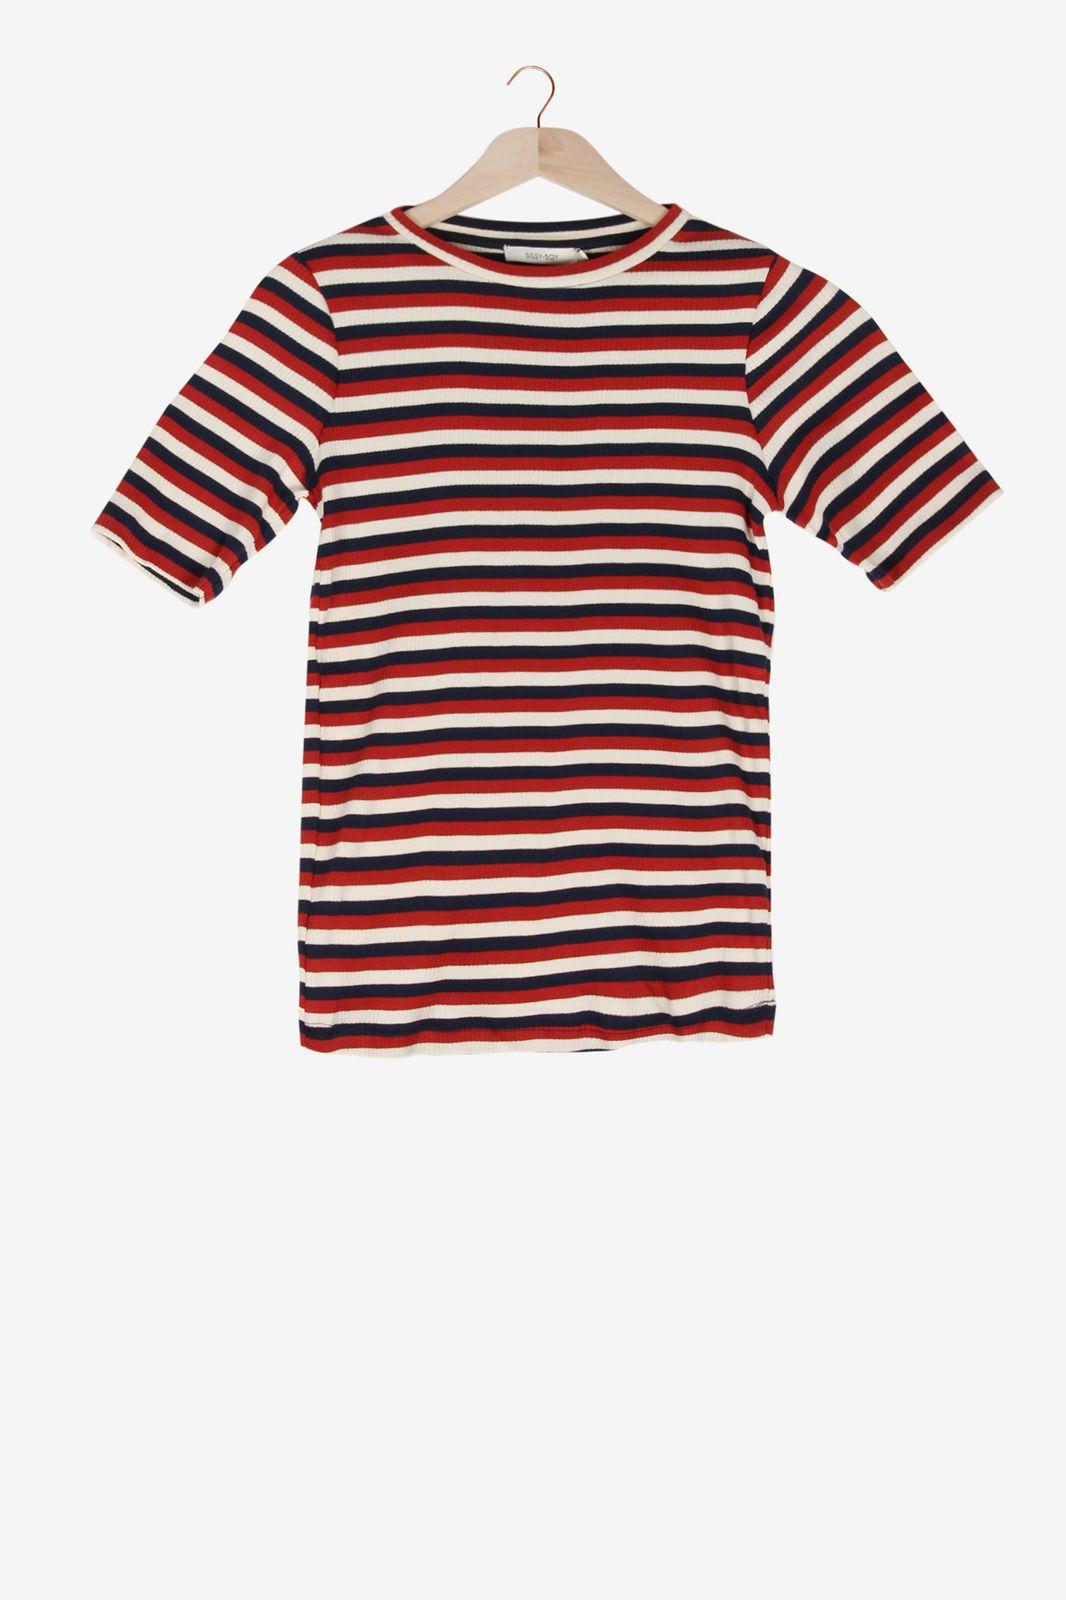 Donkerrood gestreept t-shirt